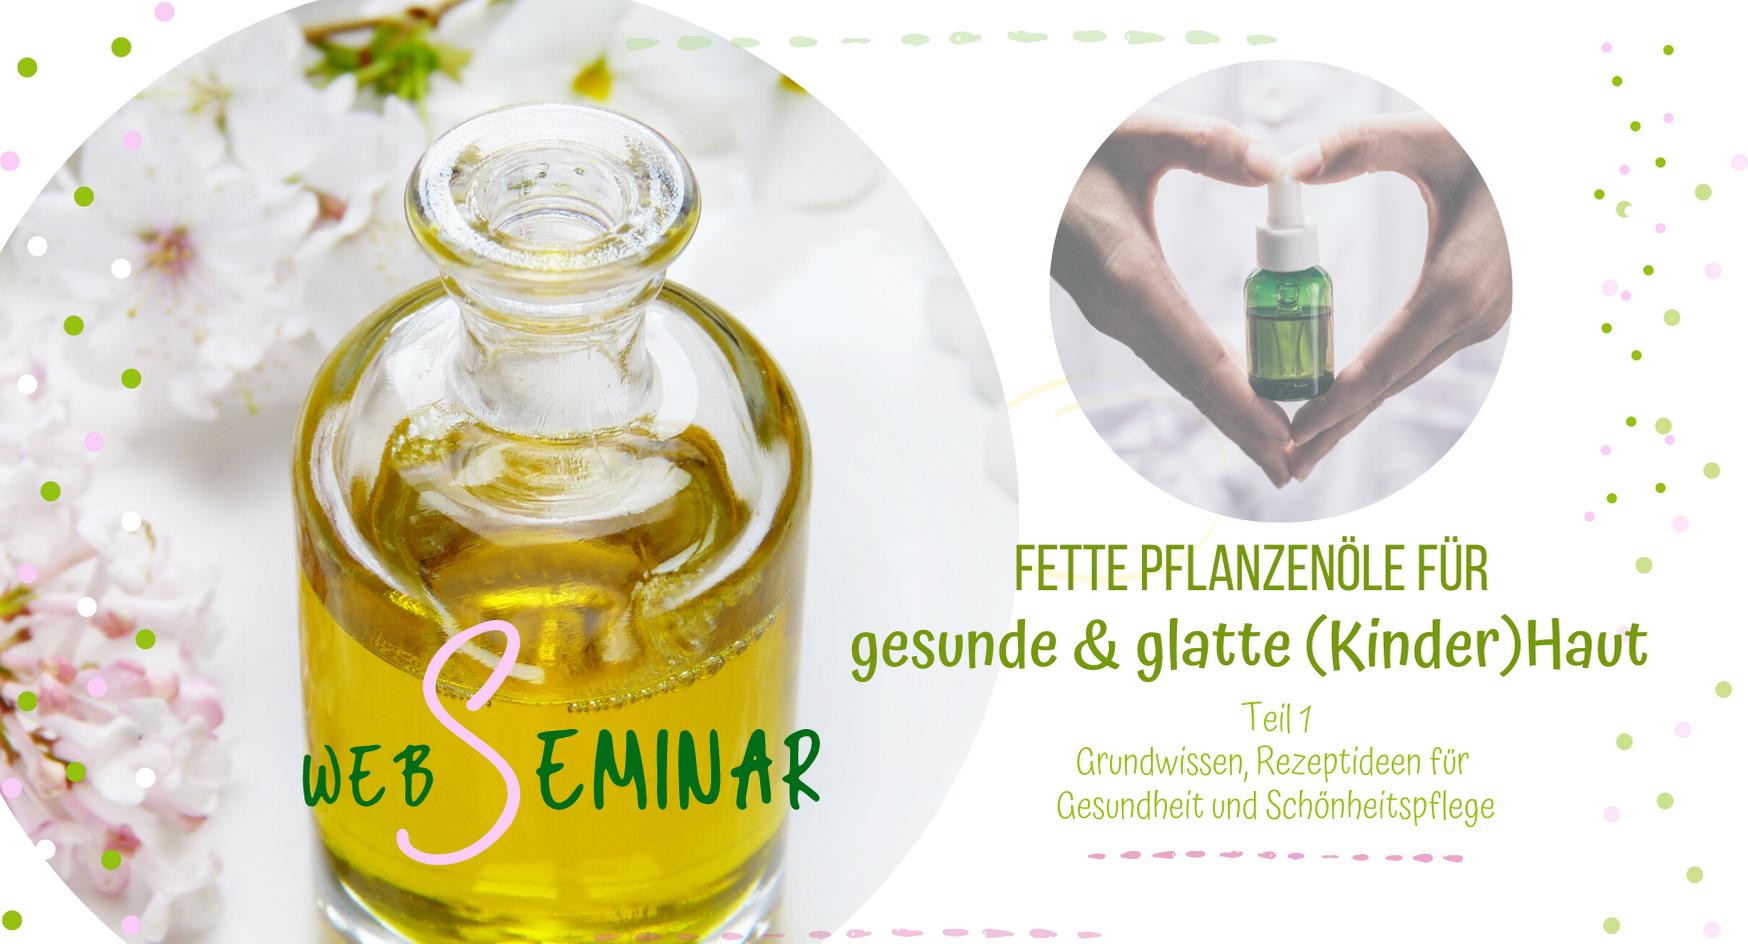 Web-Seminar Fette Öle - Aromatherapie Eliane Zimmermann